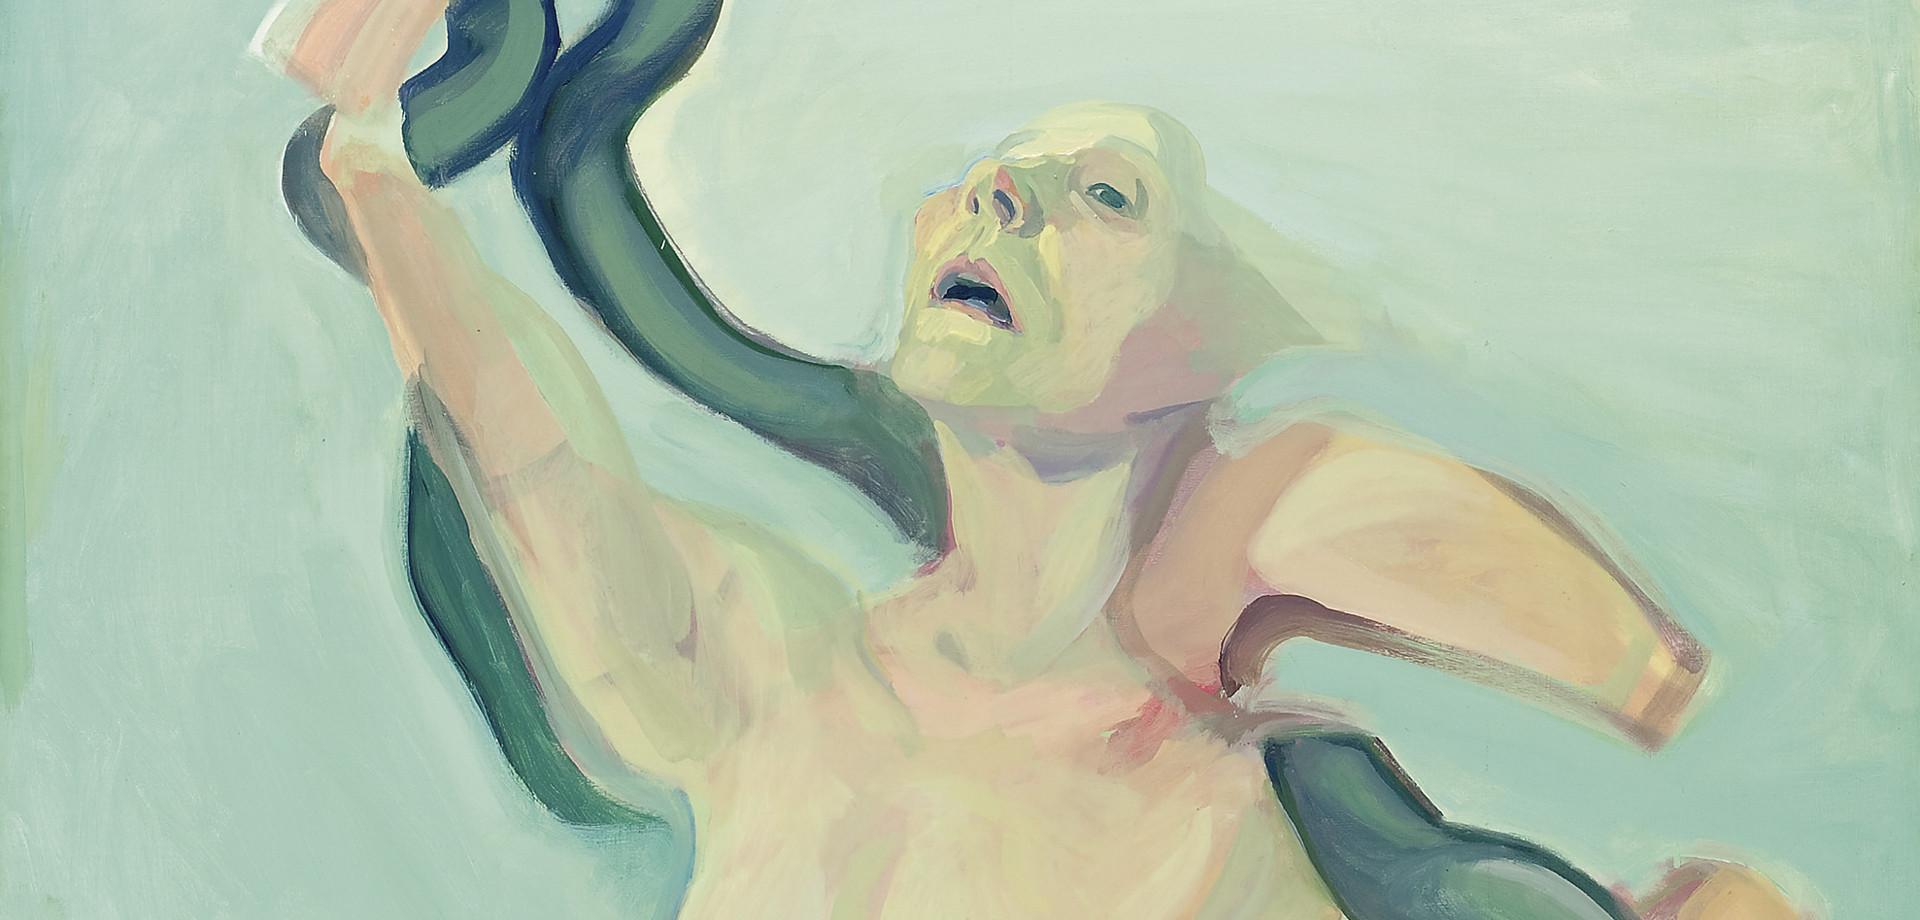 Maria Lassnig. Το Μέλλον Επινοείται με Θραύσματα του Παρελθόντος